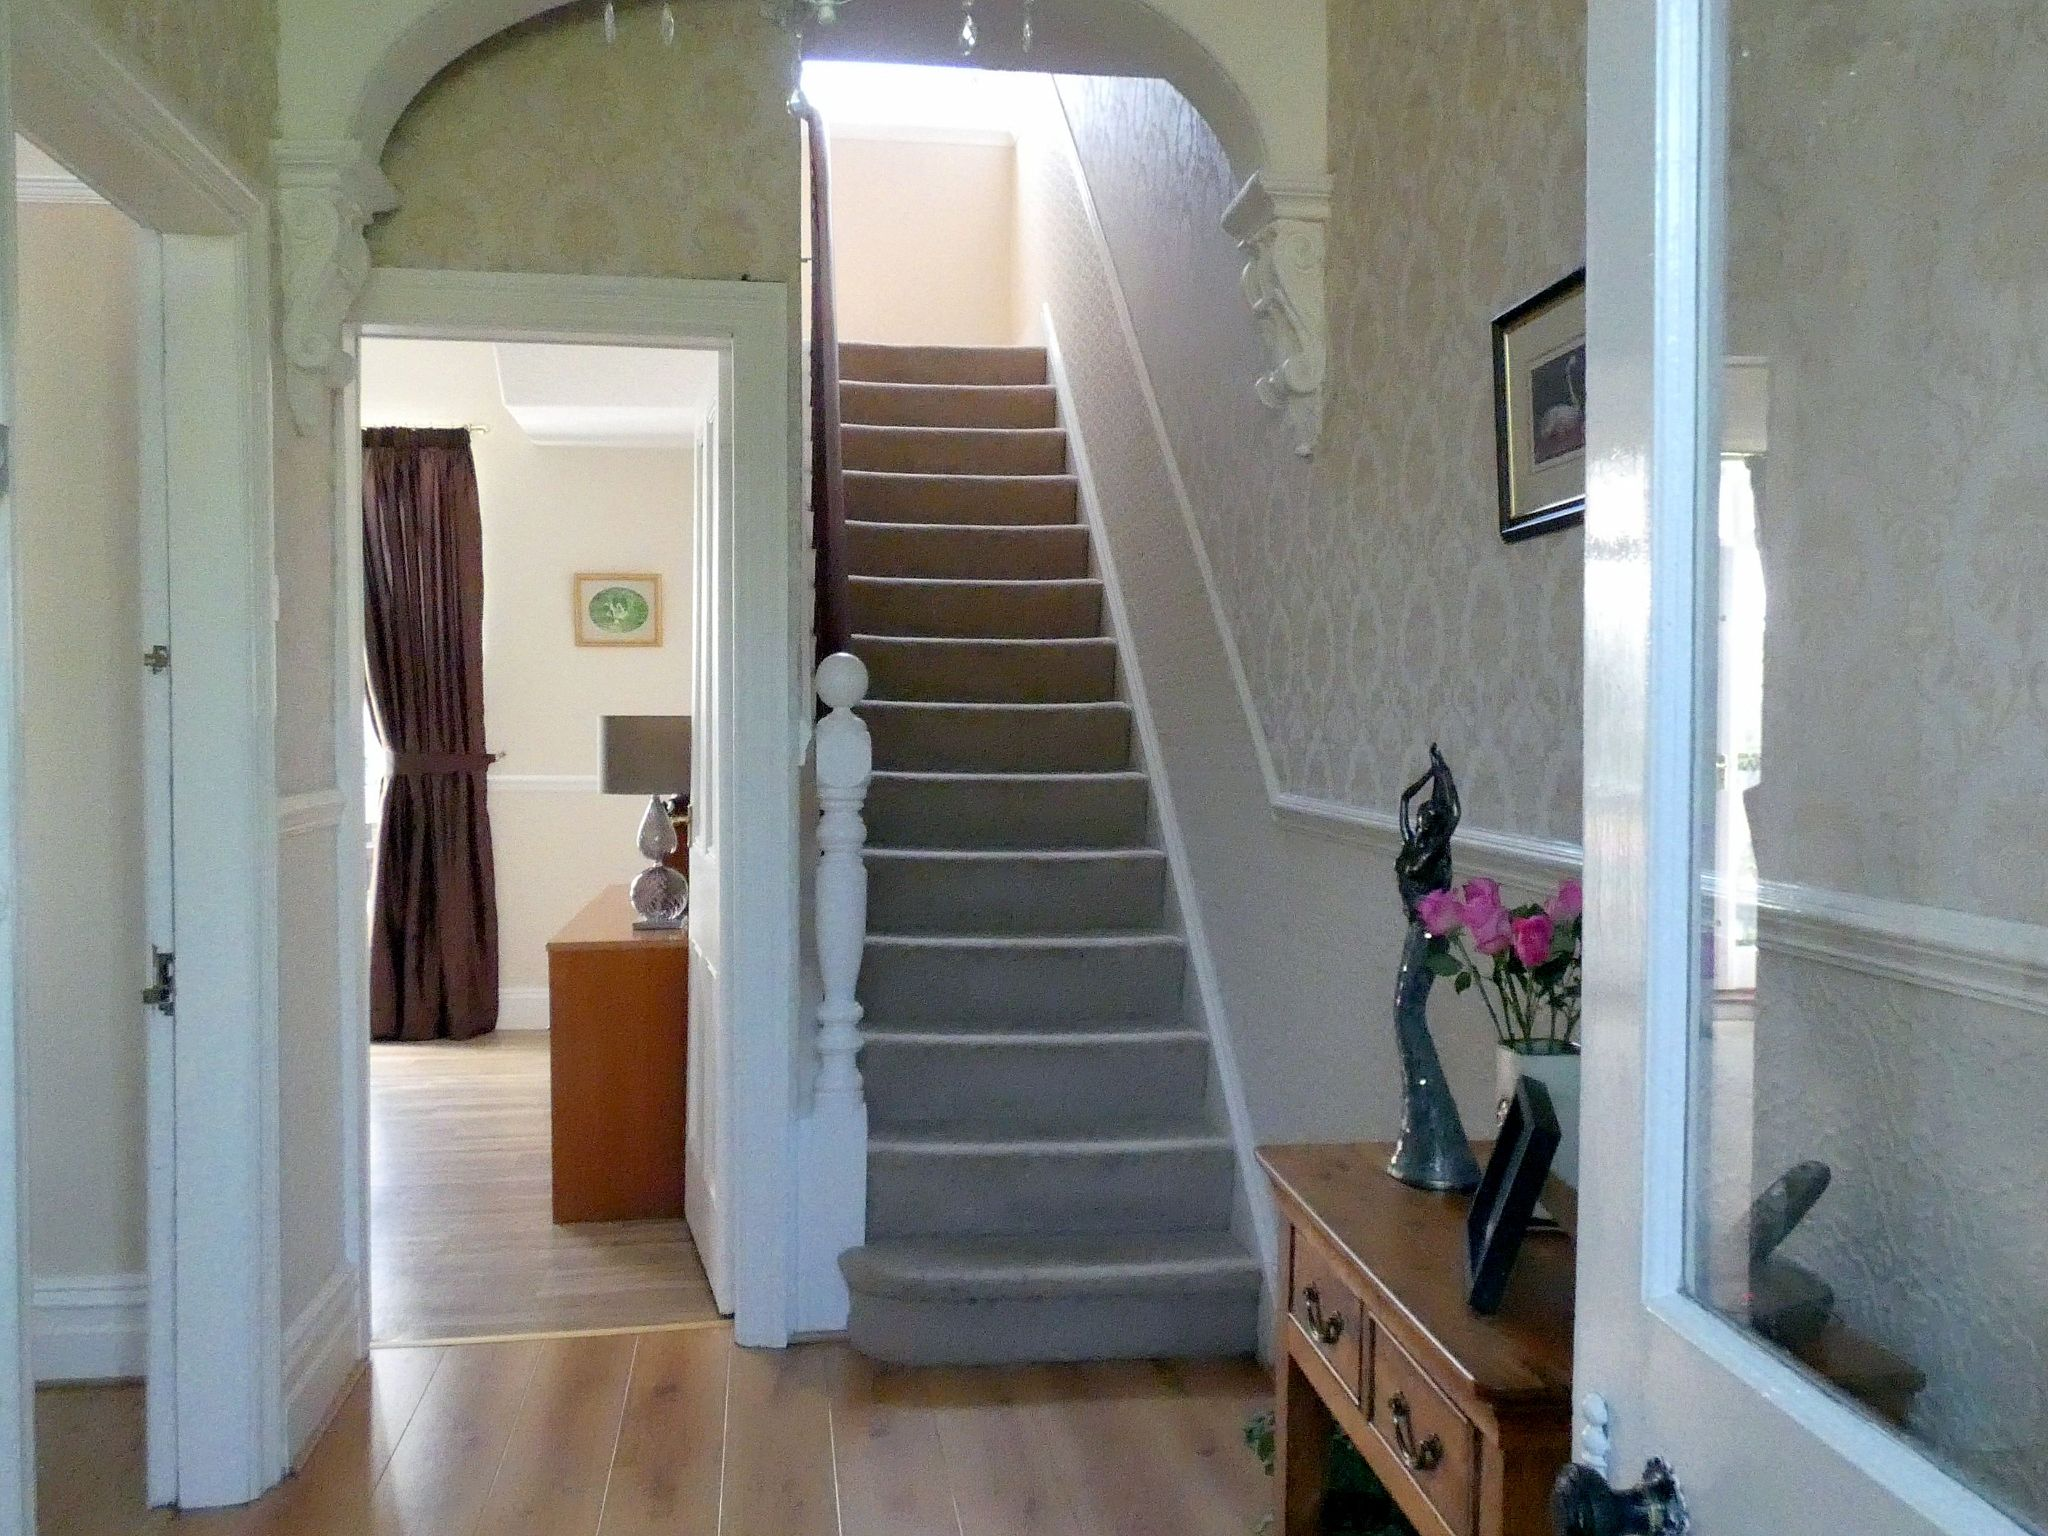 5 bedroom semi-detached house For Sale in Bishop Auckland - Reception Hallway.